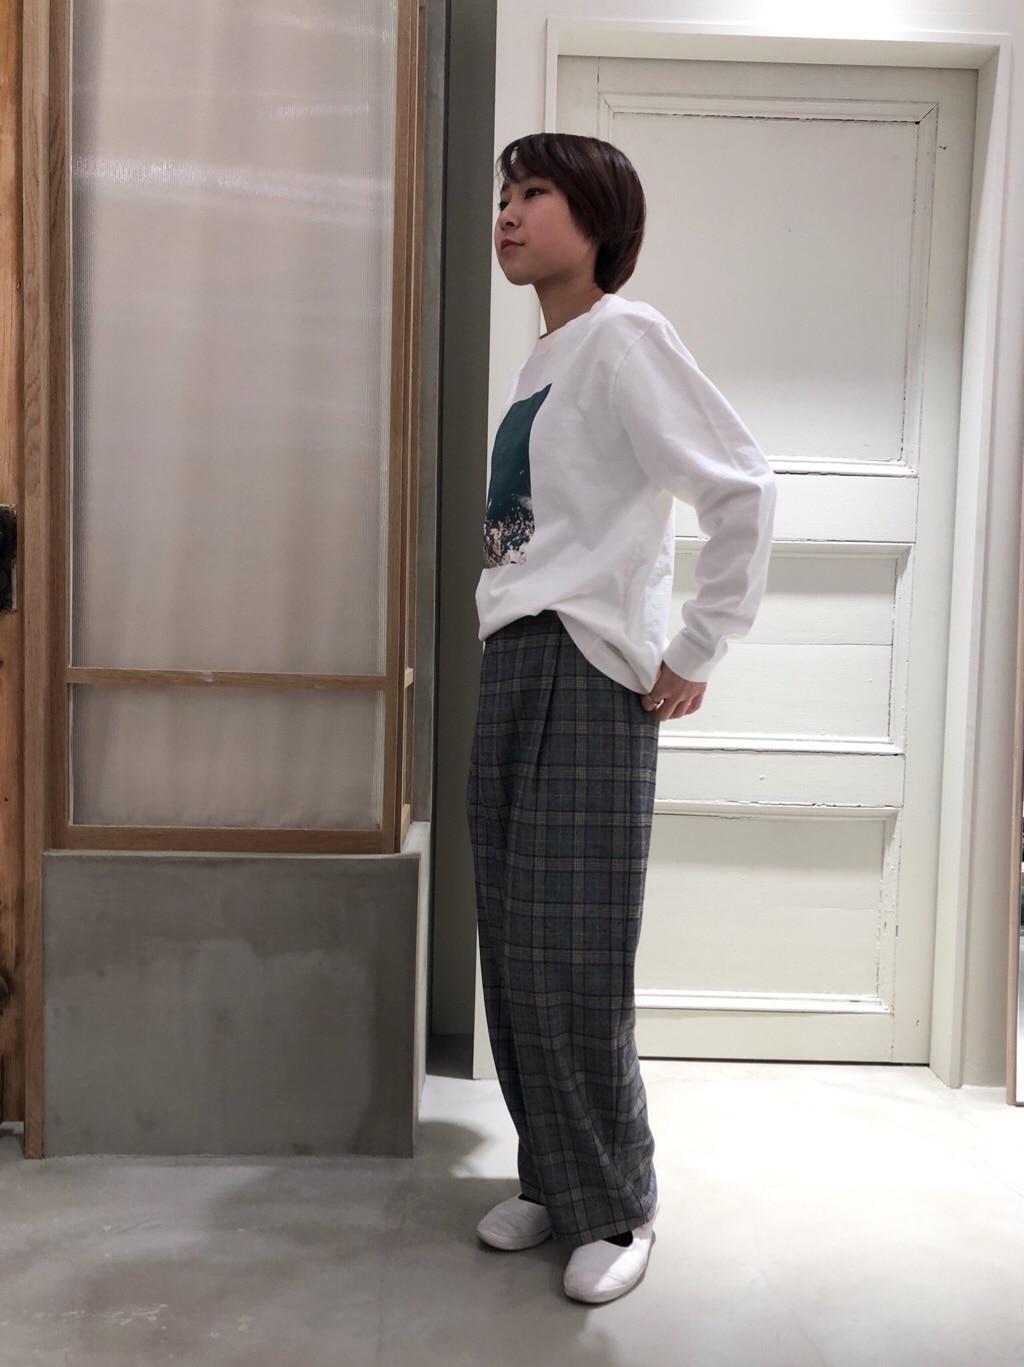 bulle de savon 渋谷スクランブルスクエア 身長:159cm 2019.12.21